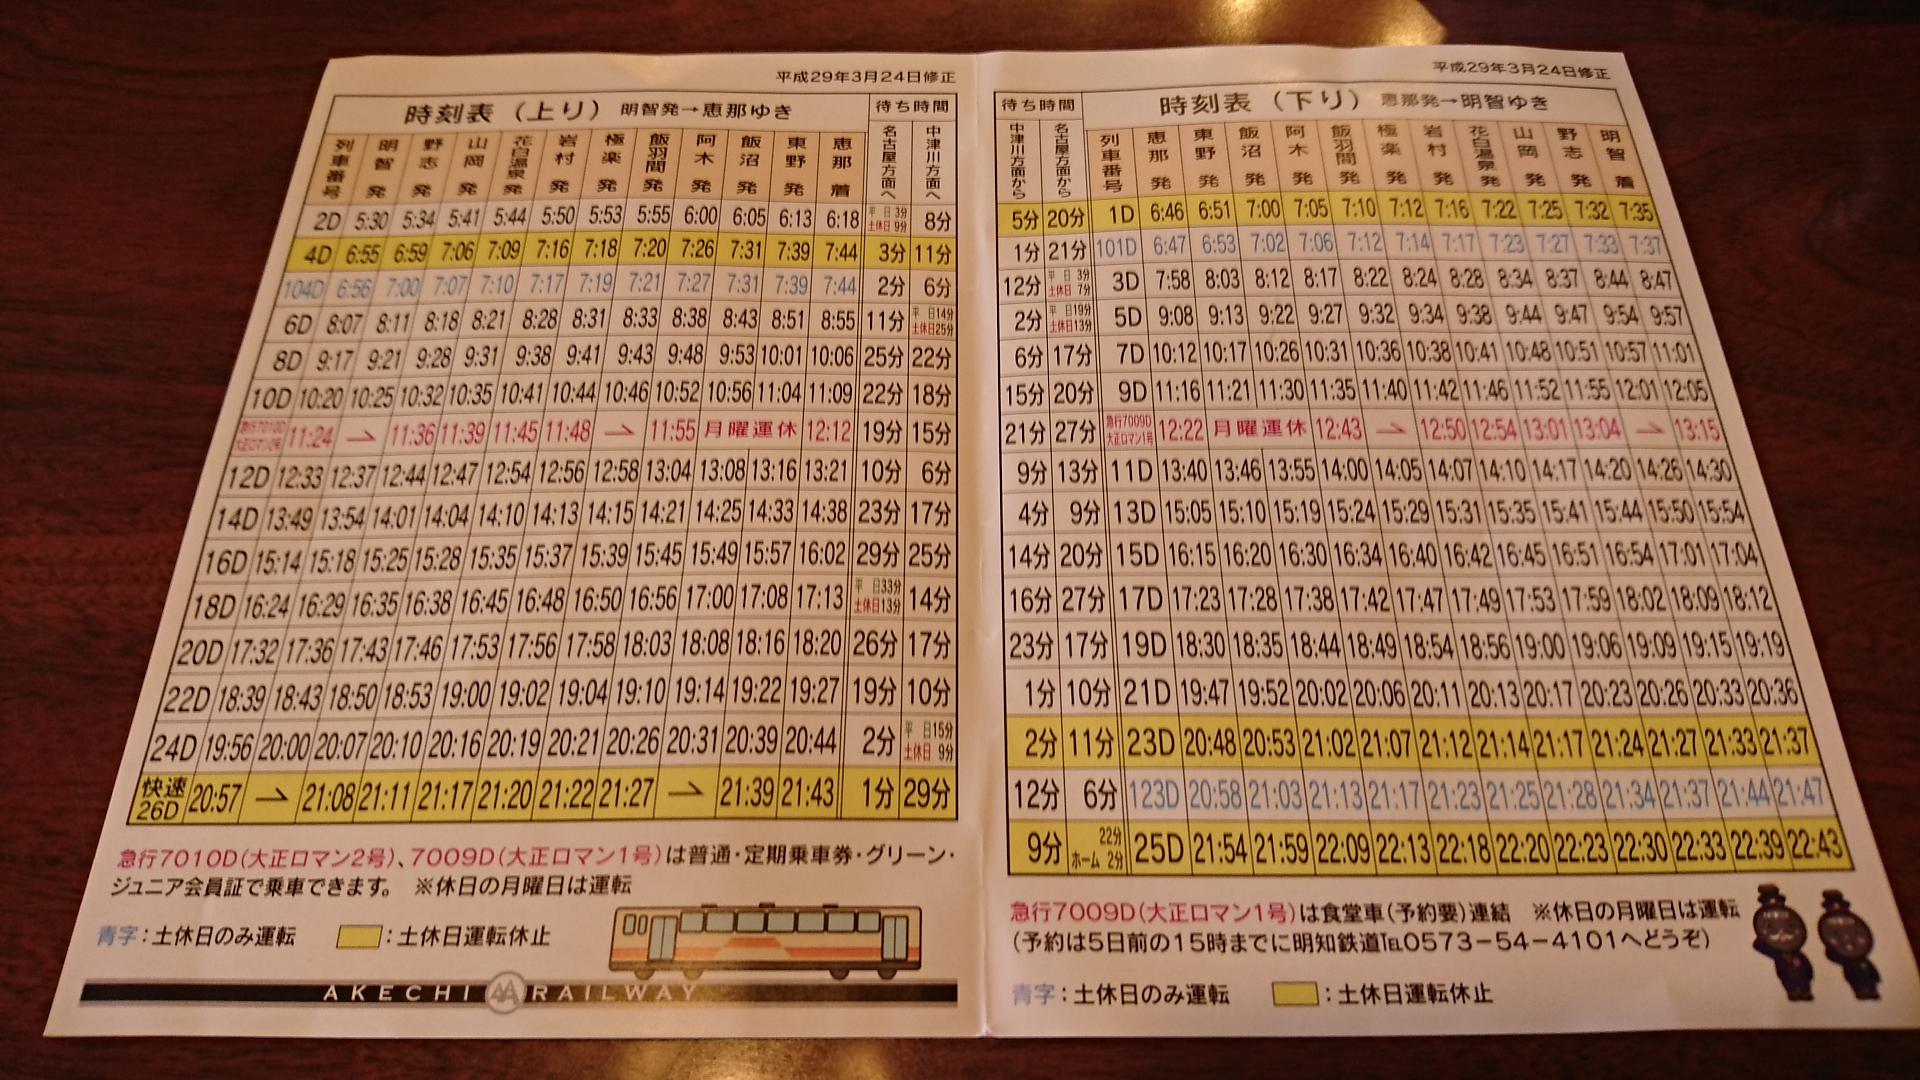 2017.5.19 大井 (54) 明知鉄道の時刻表 1920-1080